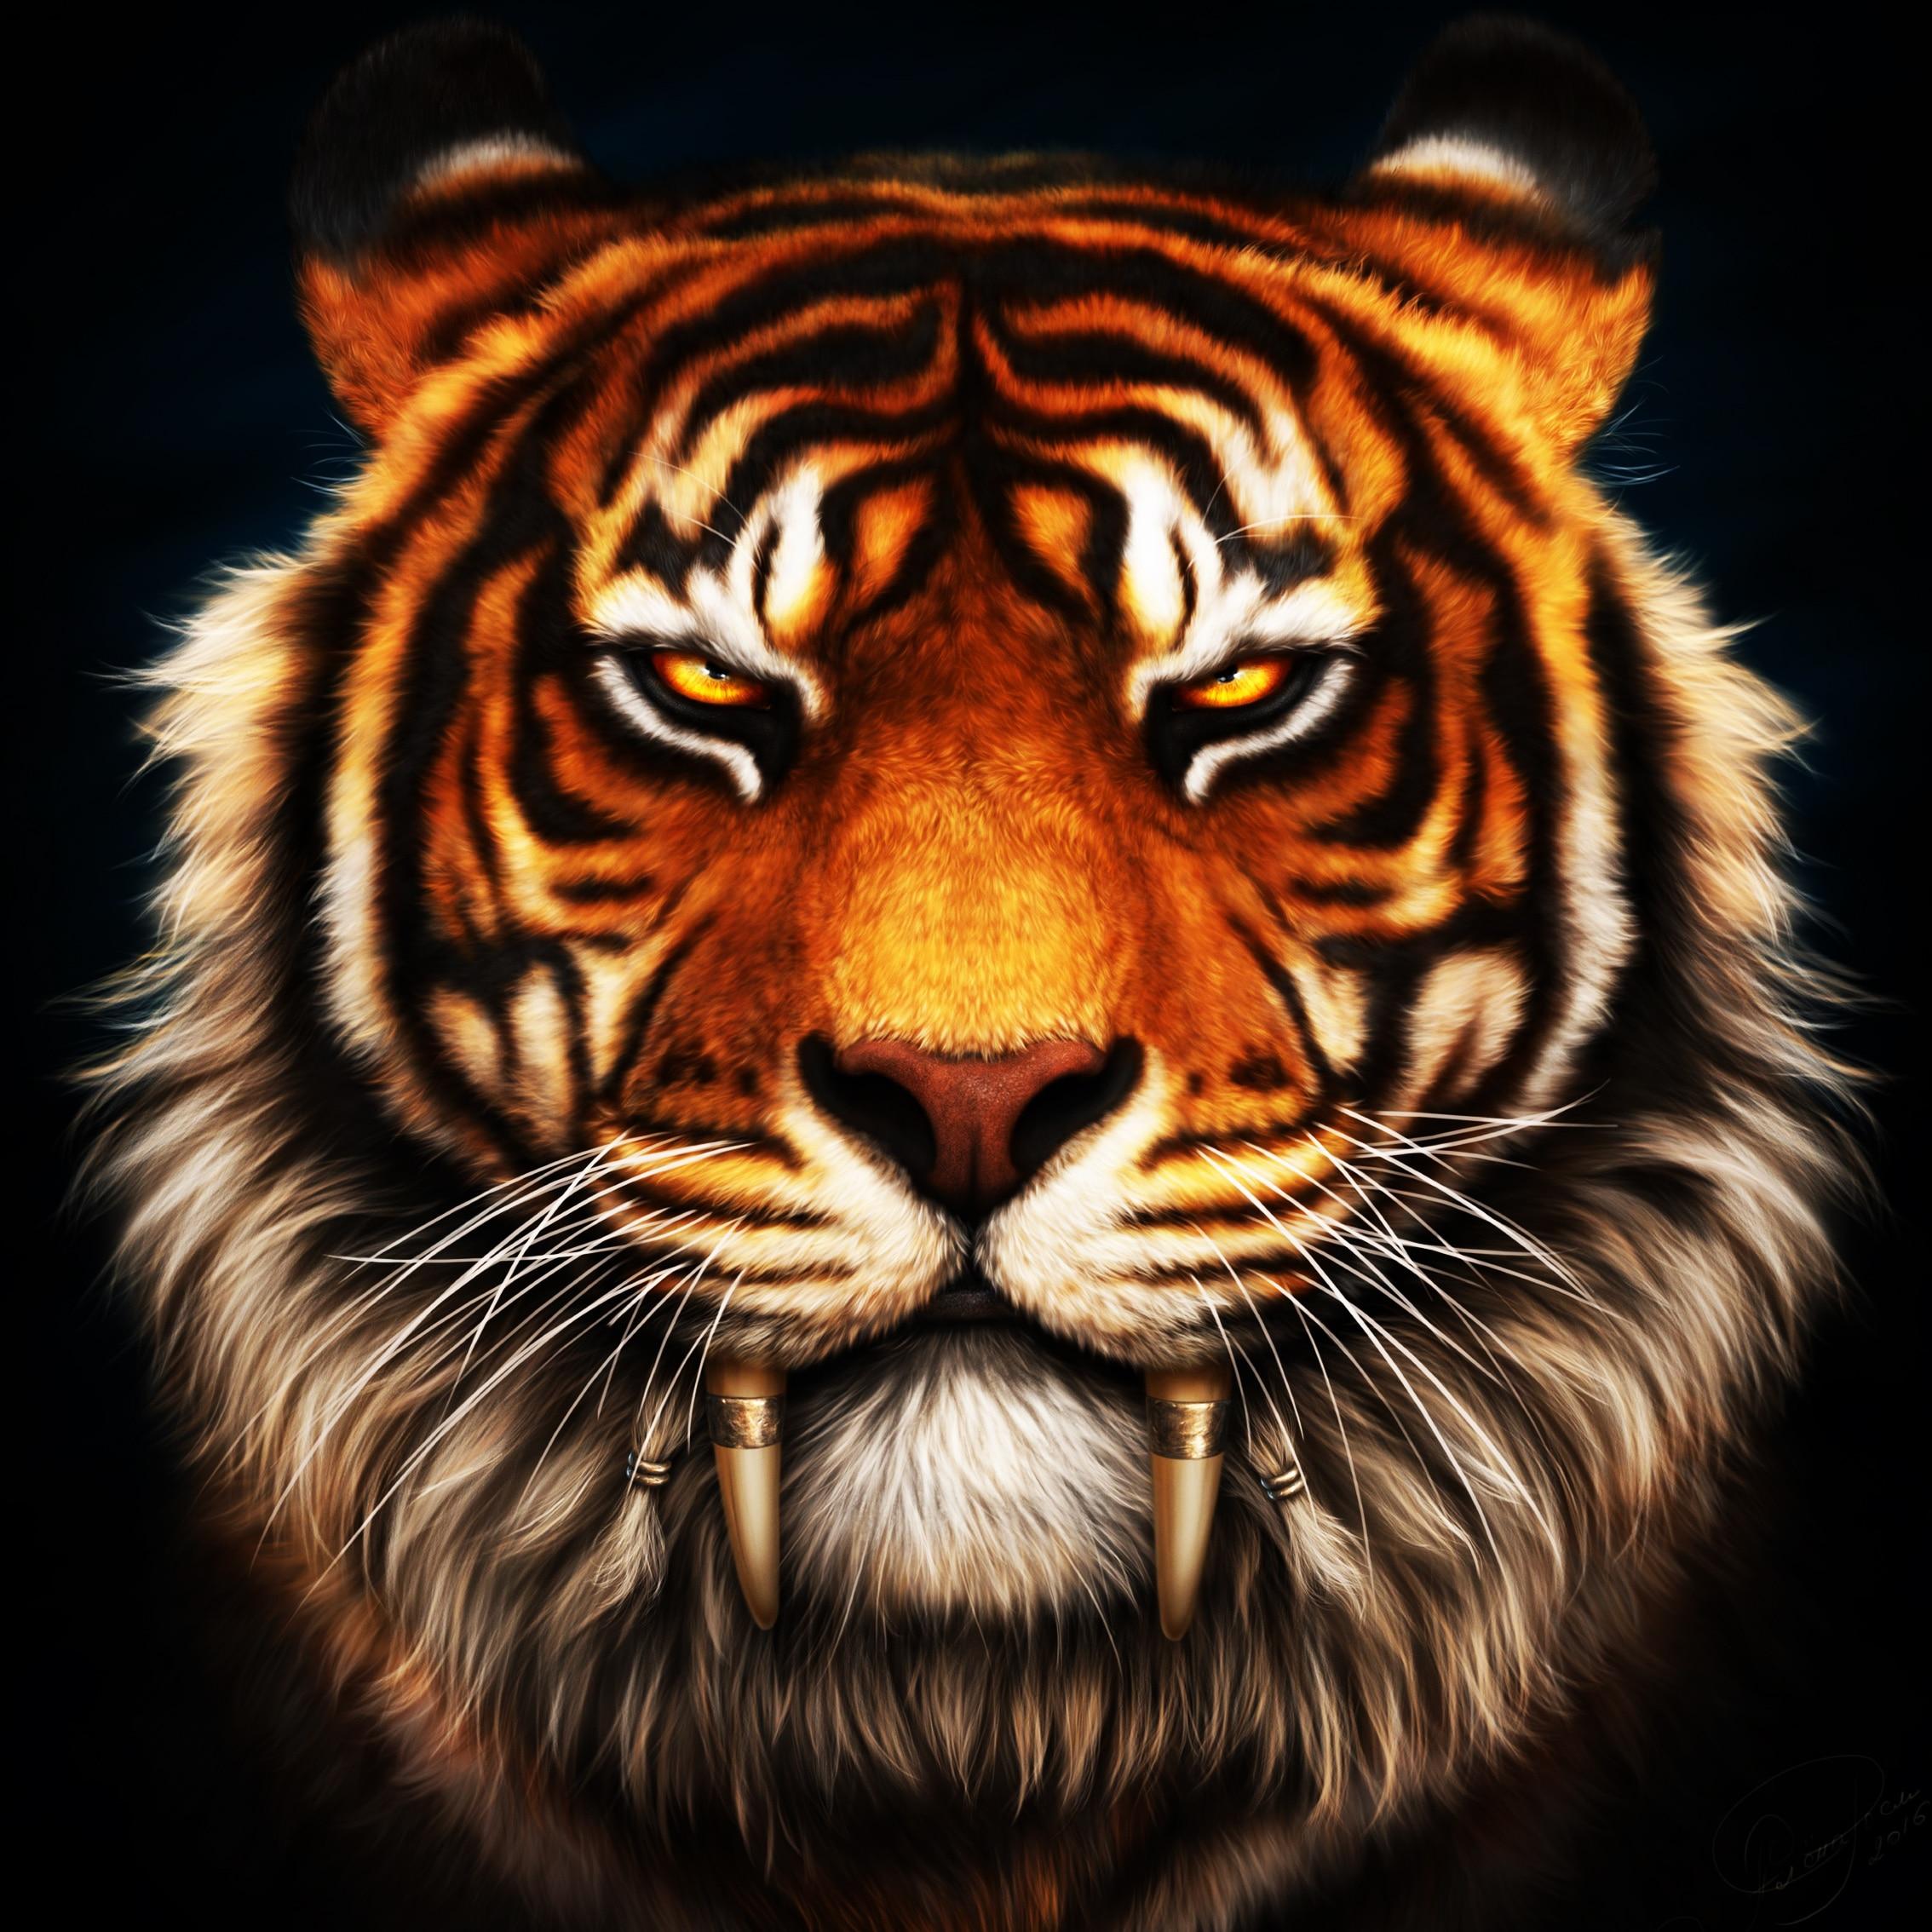 Saber Tooth Tiger 3d Wallpaper Face Tiger Fangs Sabretooth Living Room Home Art Decor